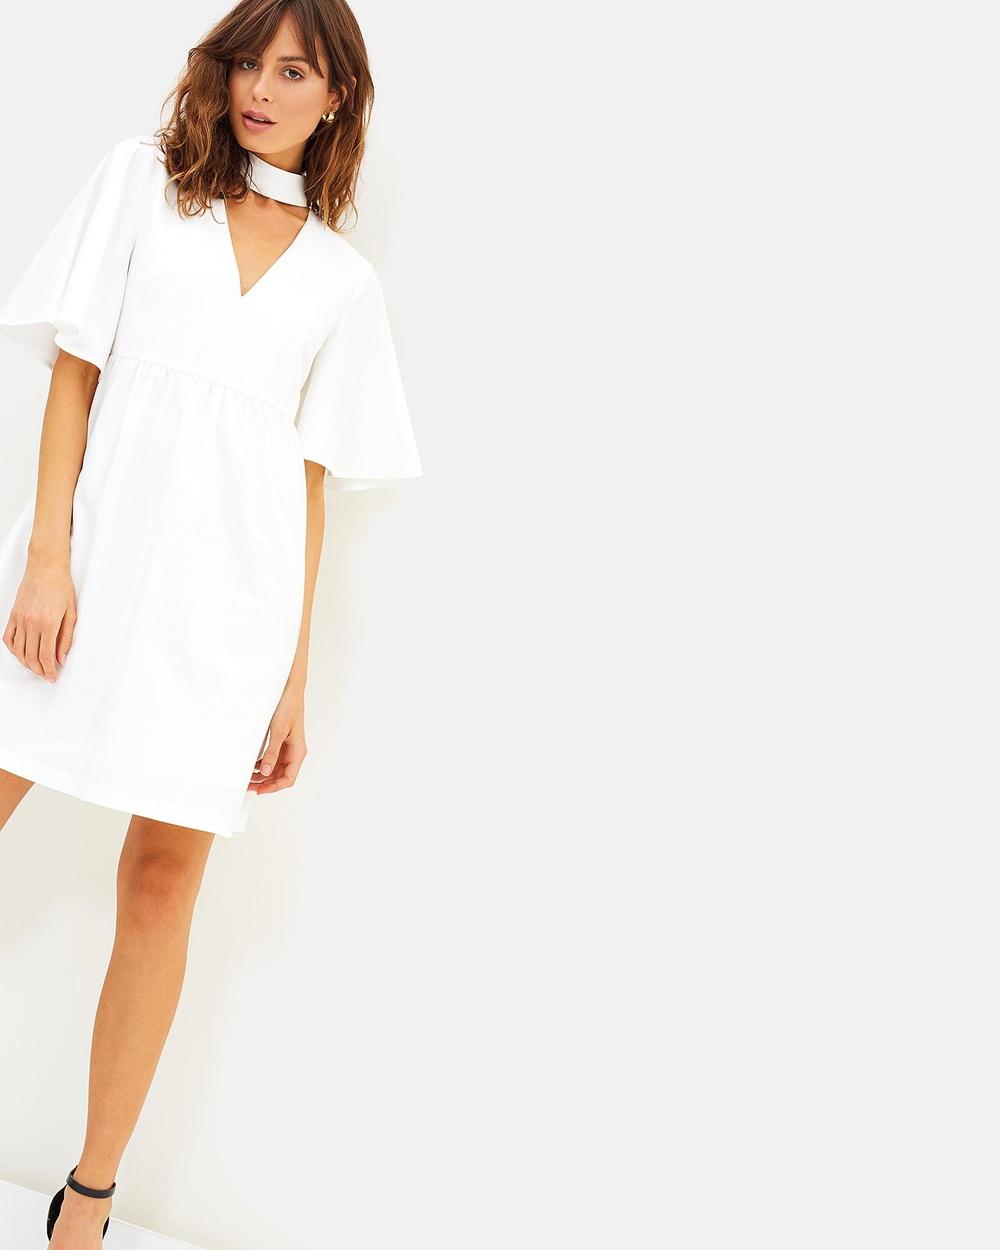 Friend of Audrey Summer Day Dress Dresses White Summer Day Dress